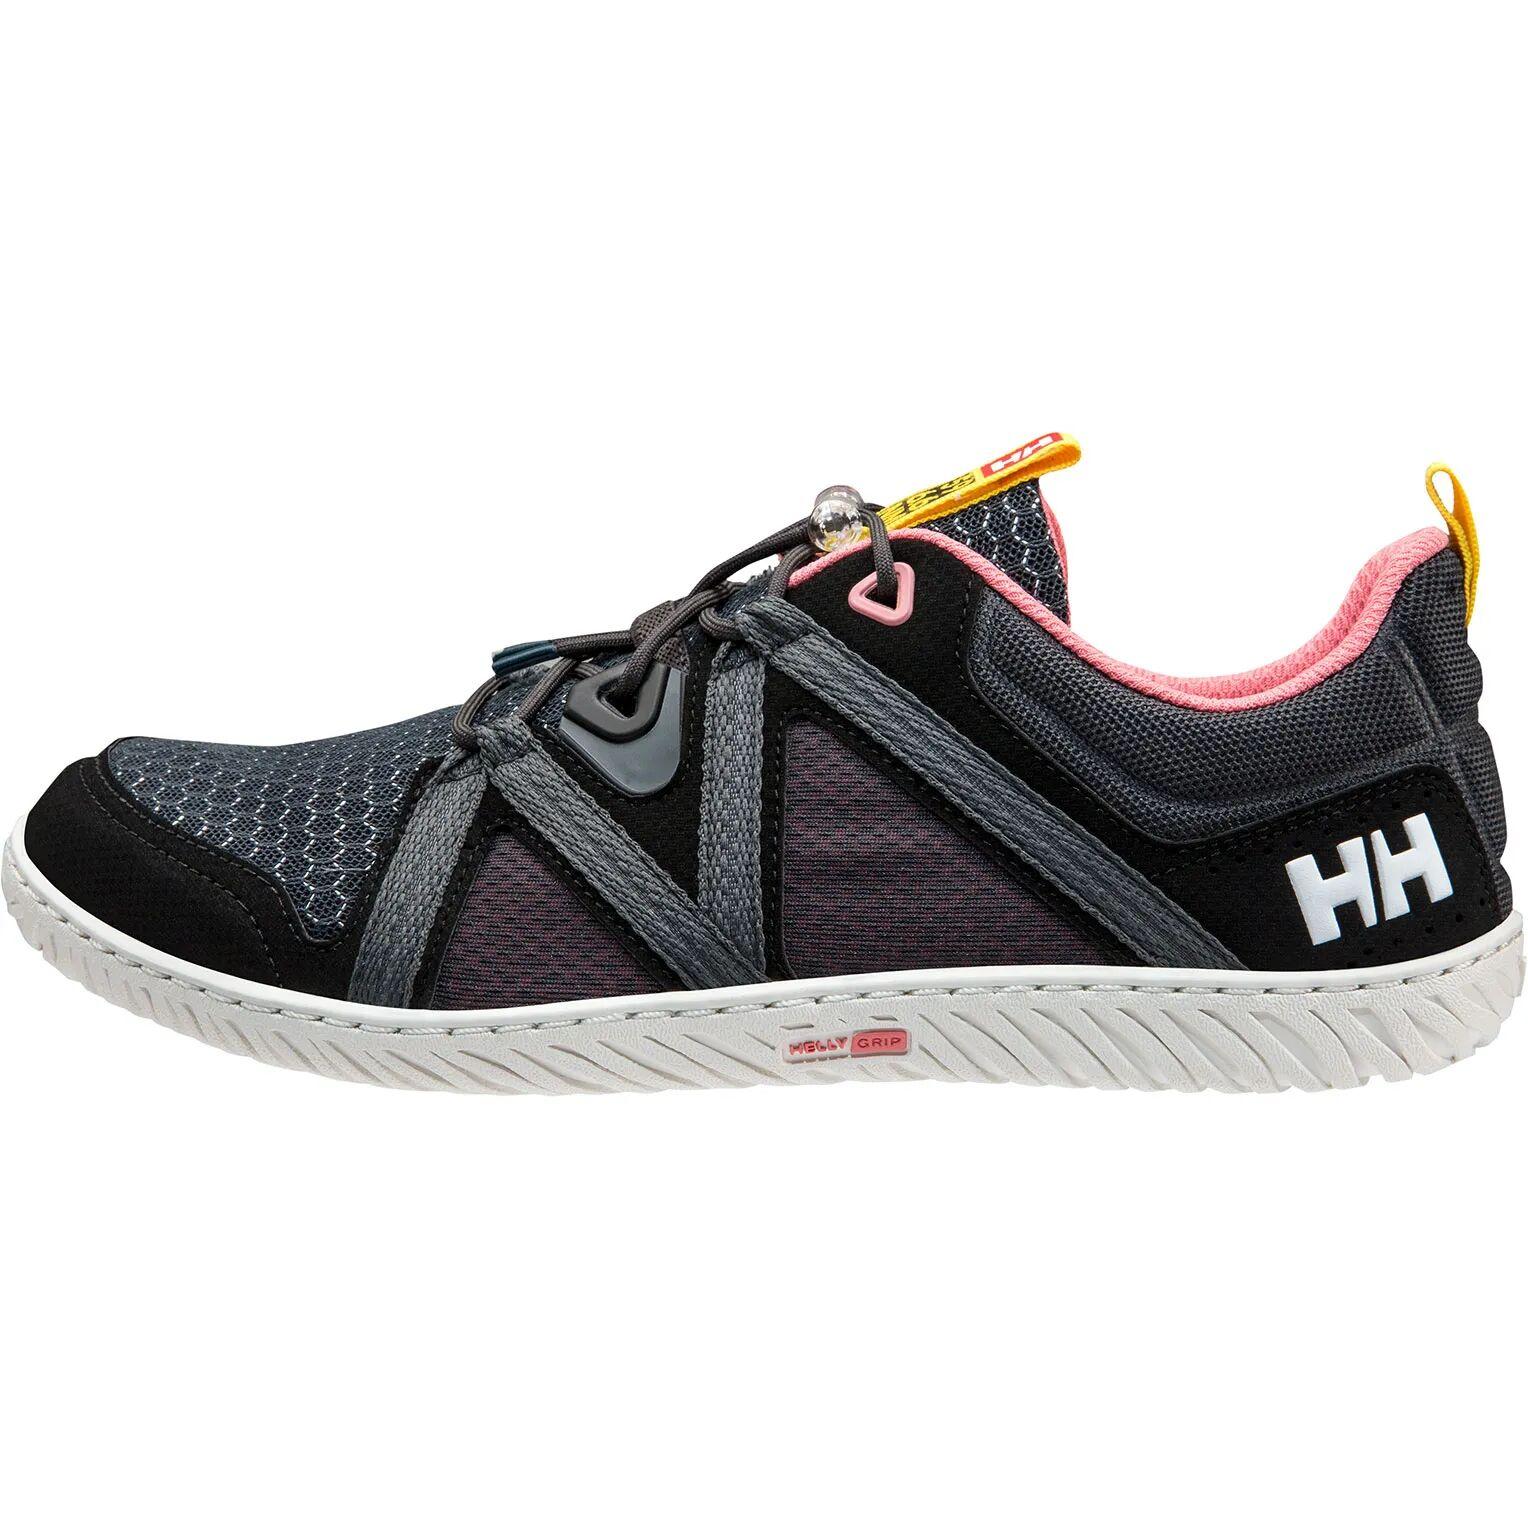 Helly Hansen W Hp Foil F1 Womens Sailing Shoe Black 38.7/7.5